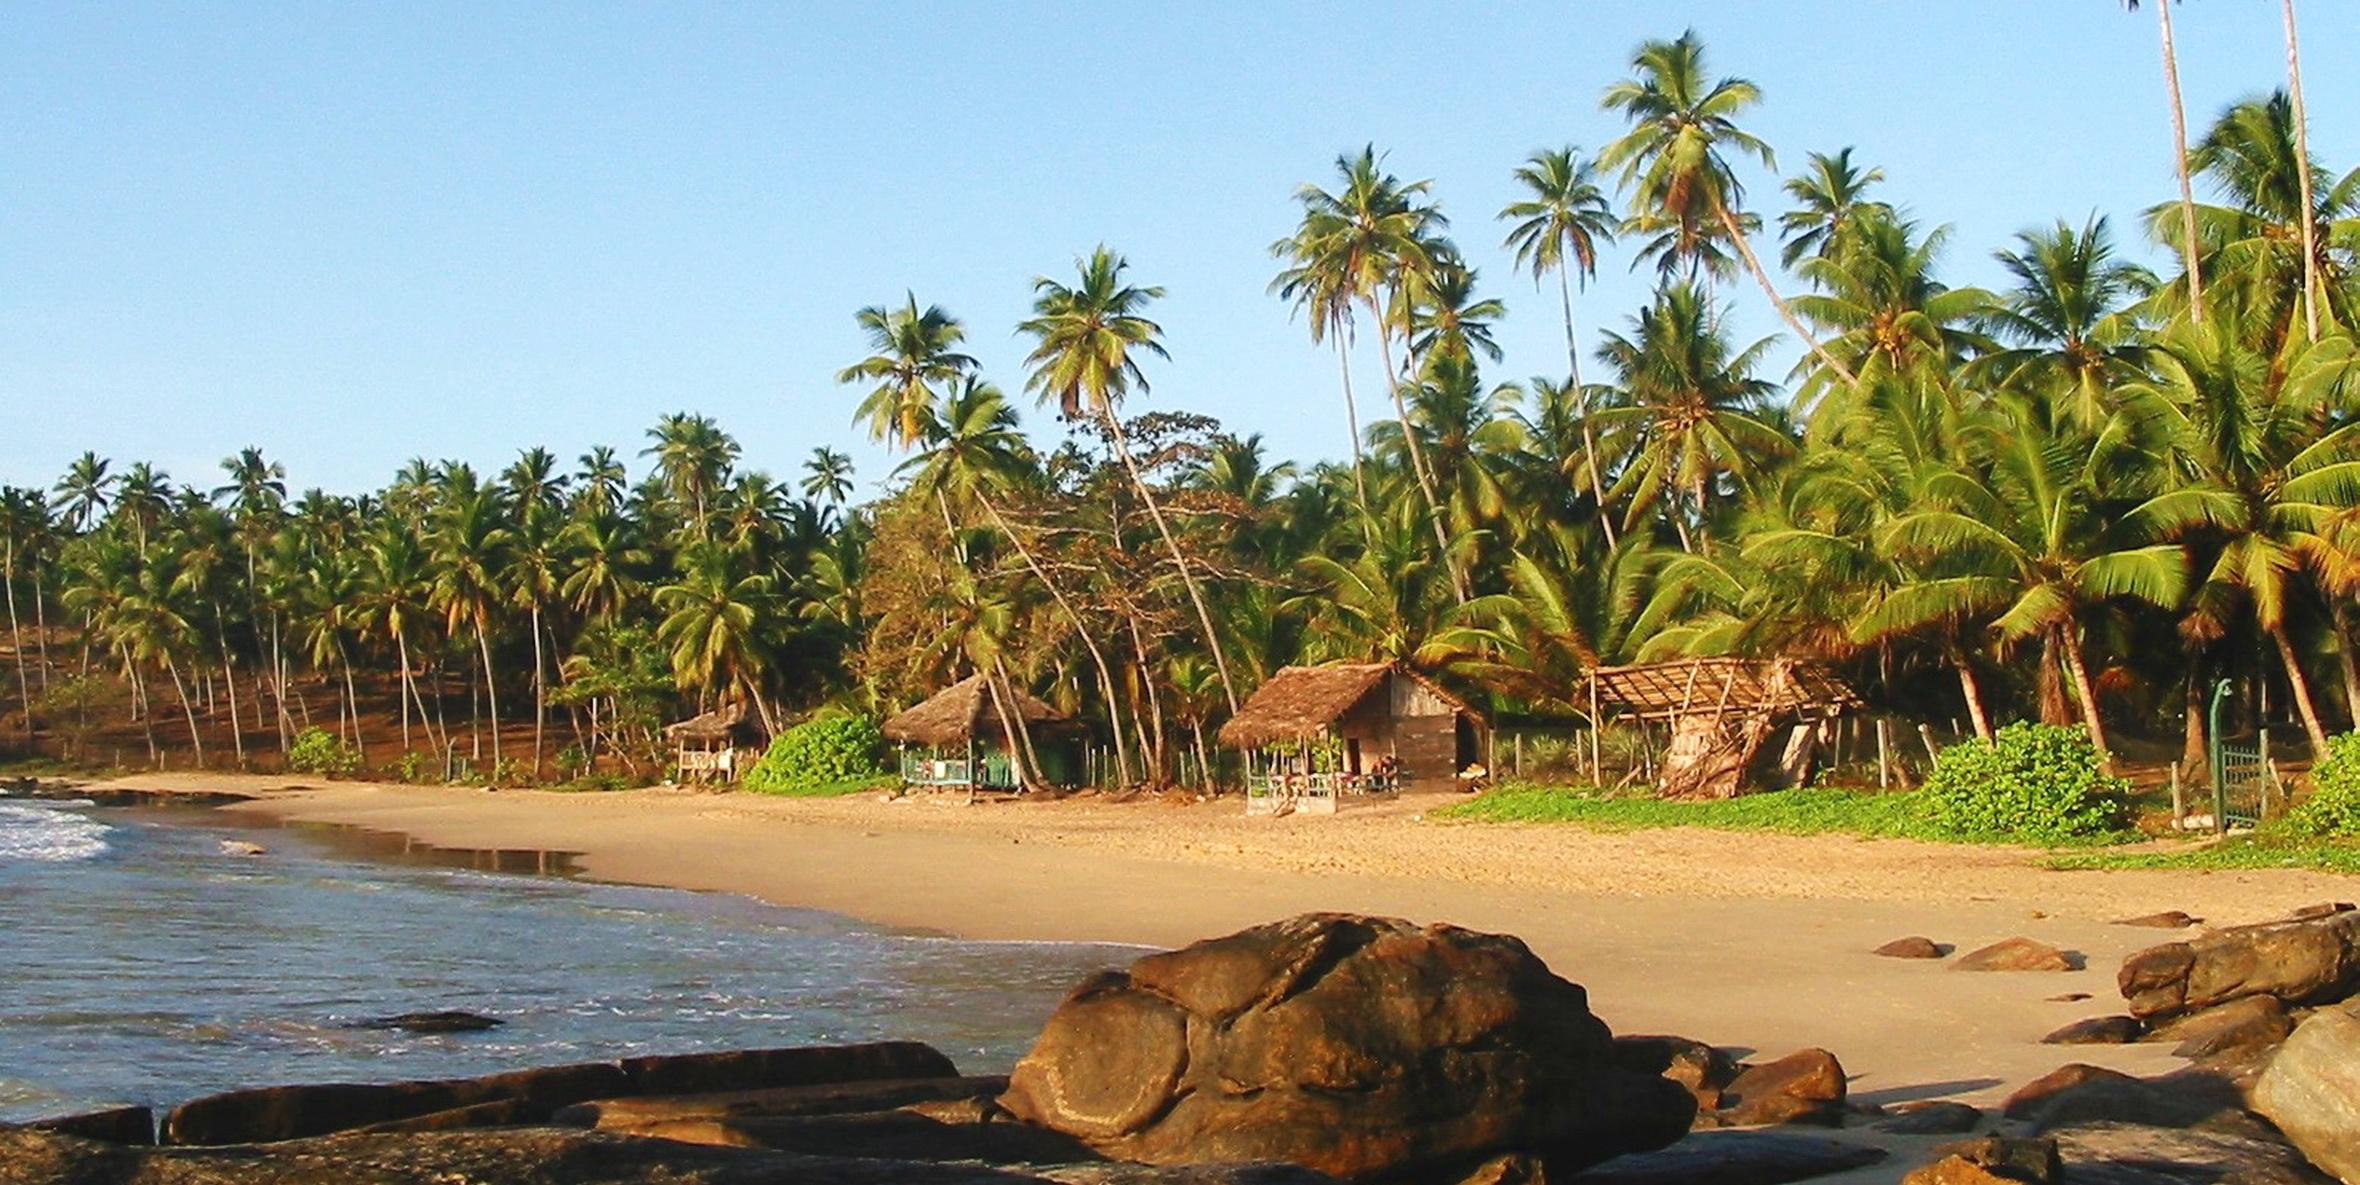 Tangalle Sri Lanka  city images : Tangalle Beach, Sri Lanka